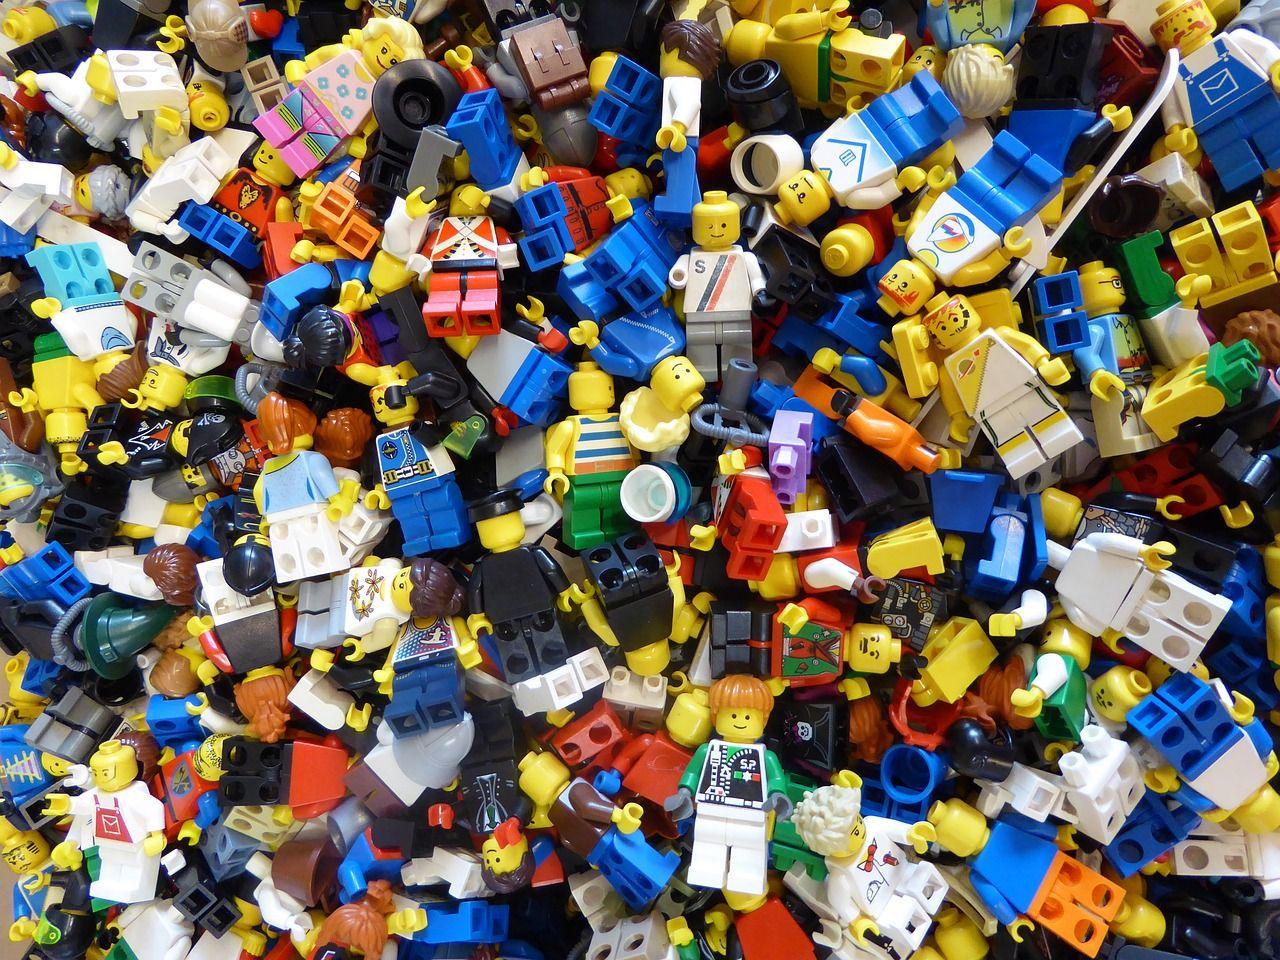 lego-blocks-1645504_1280.jpg.4b725a9e27b1c01fd497e85df83dd26c.jpg